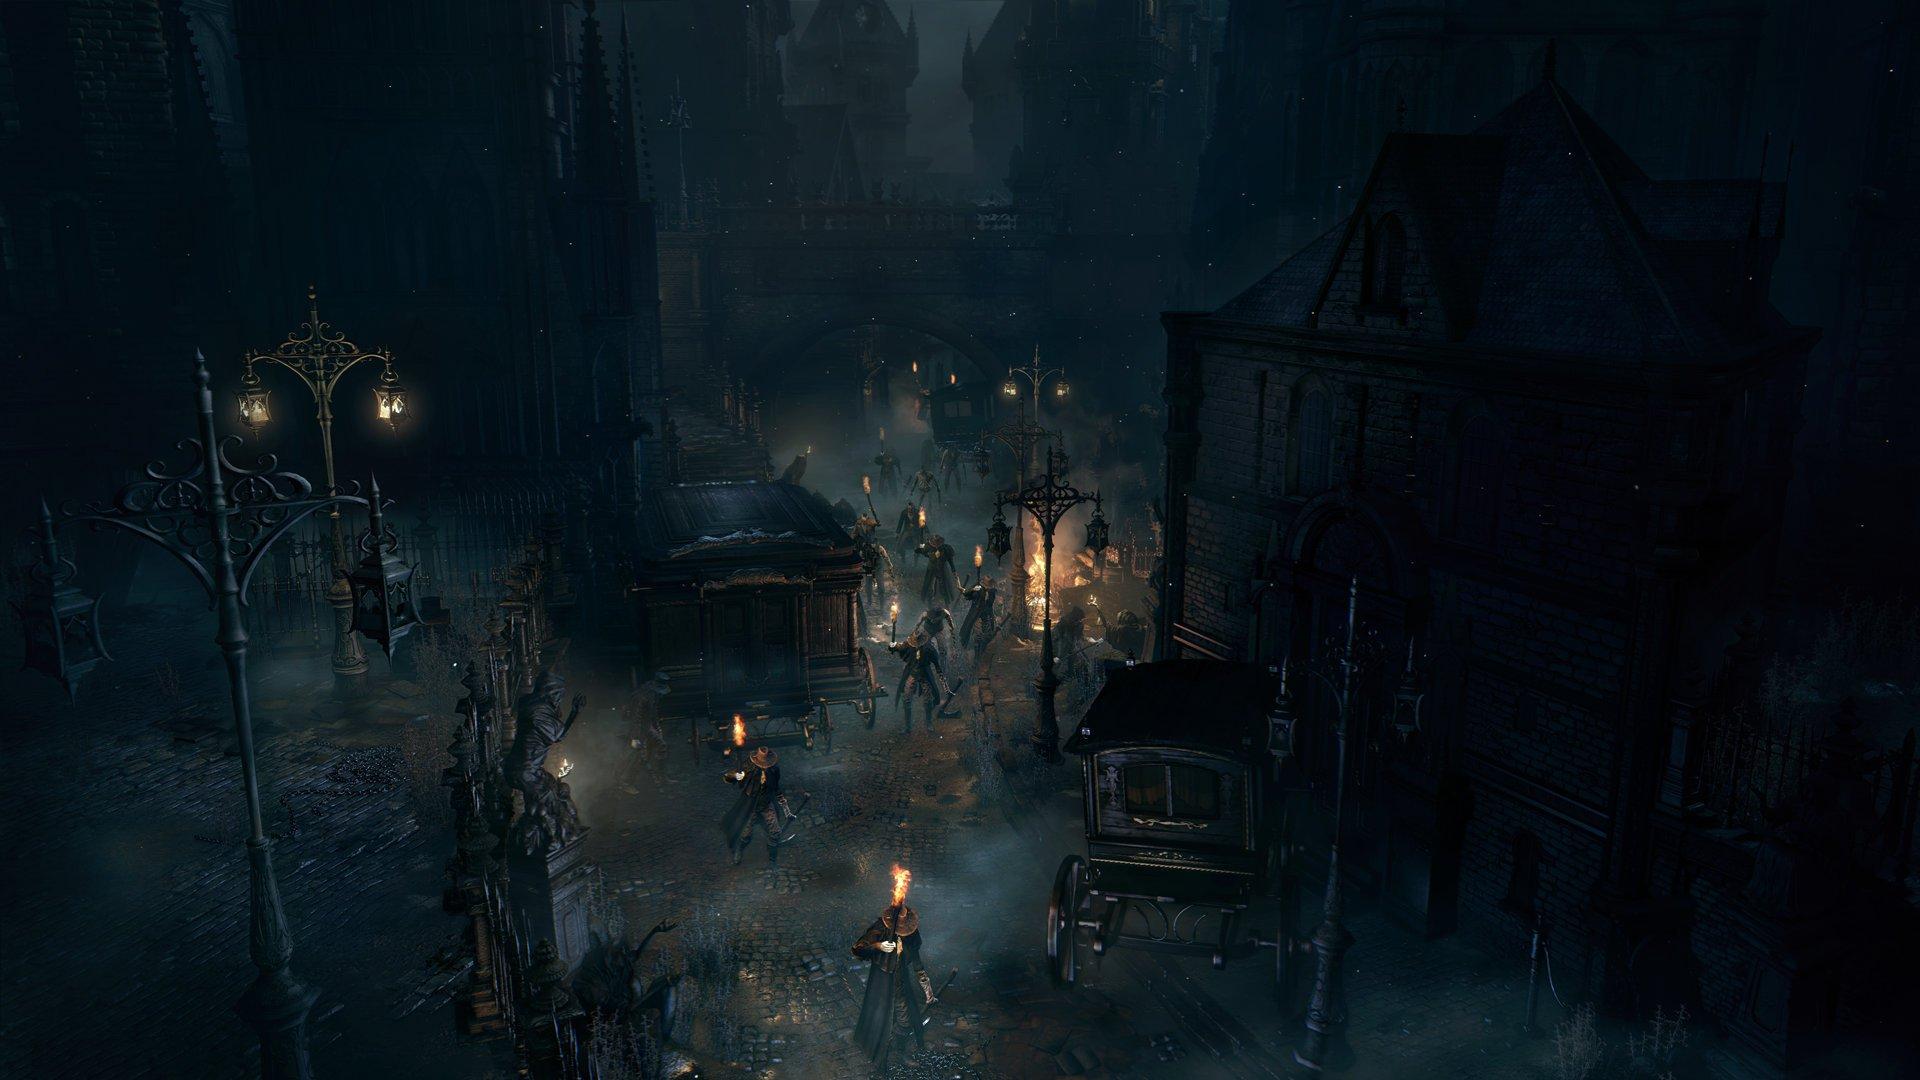 bloodborne video game wallpaper 48821